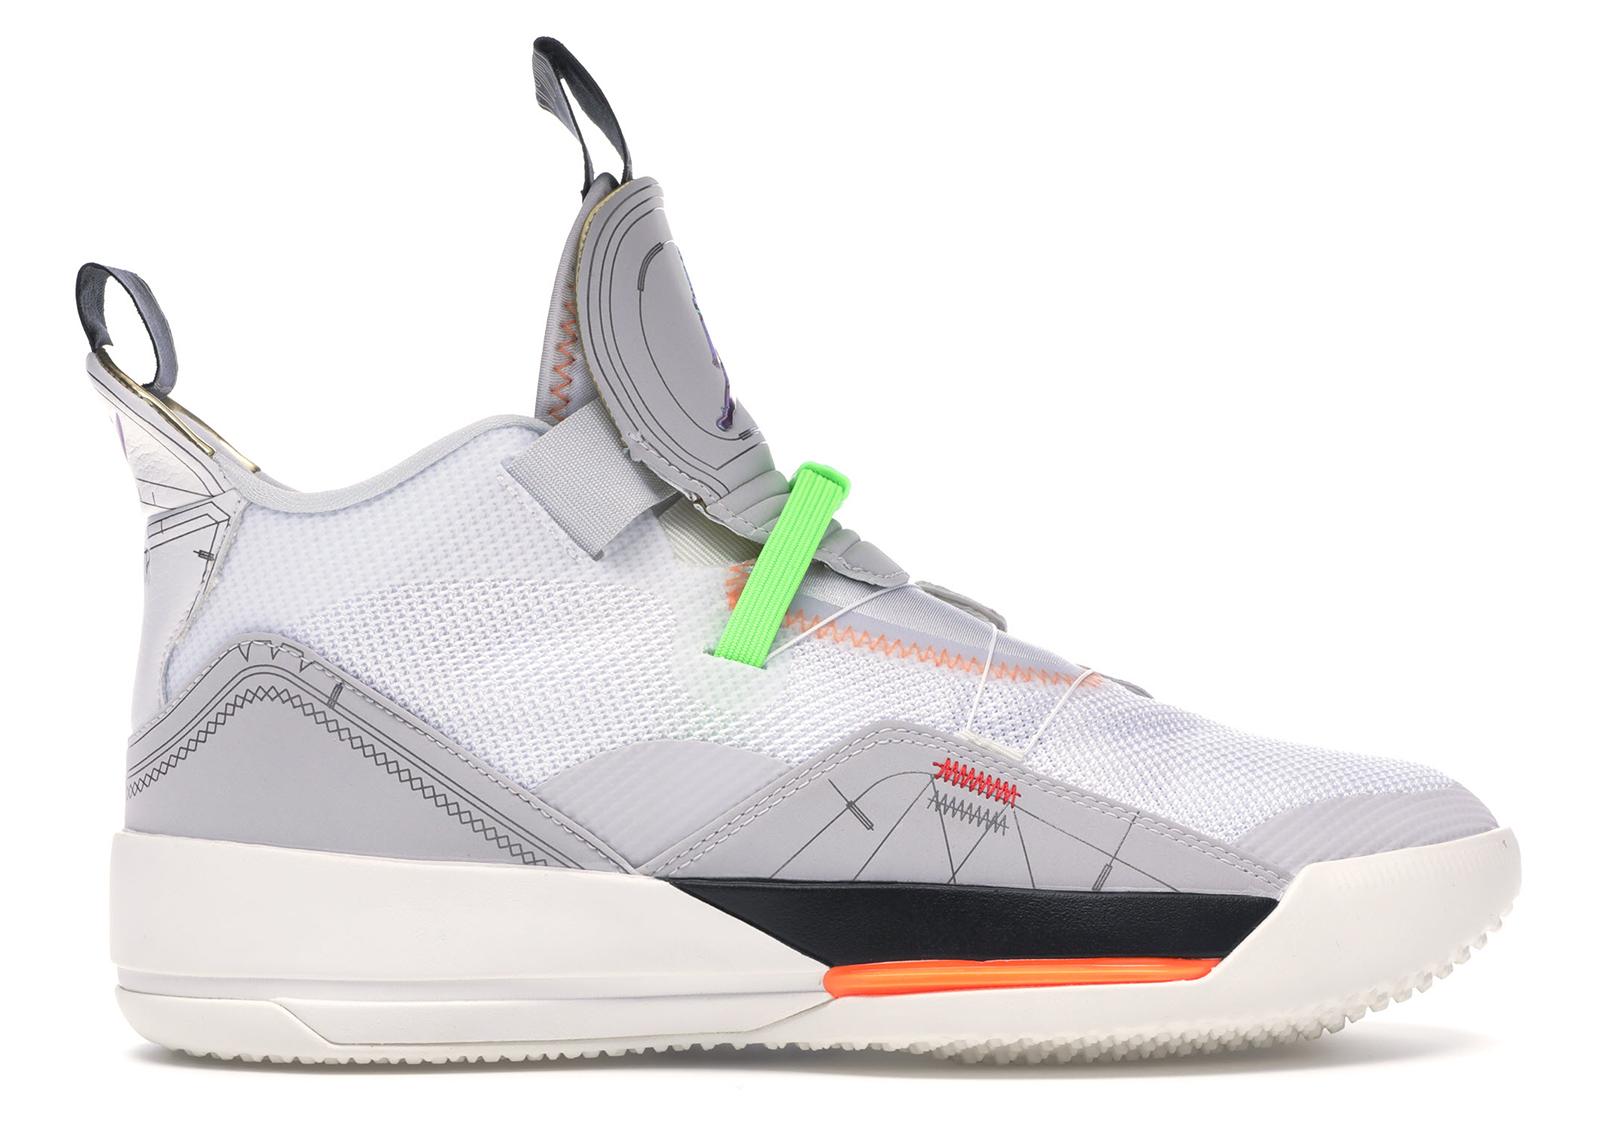 Jordan XXXIII Vast Grey - AQ8830-004